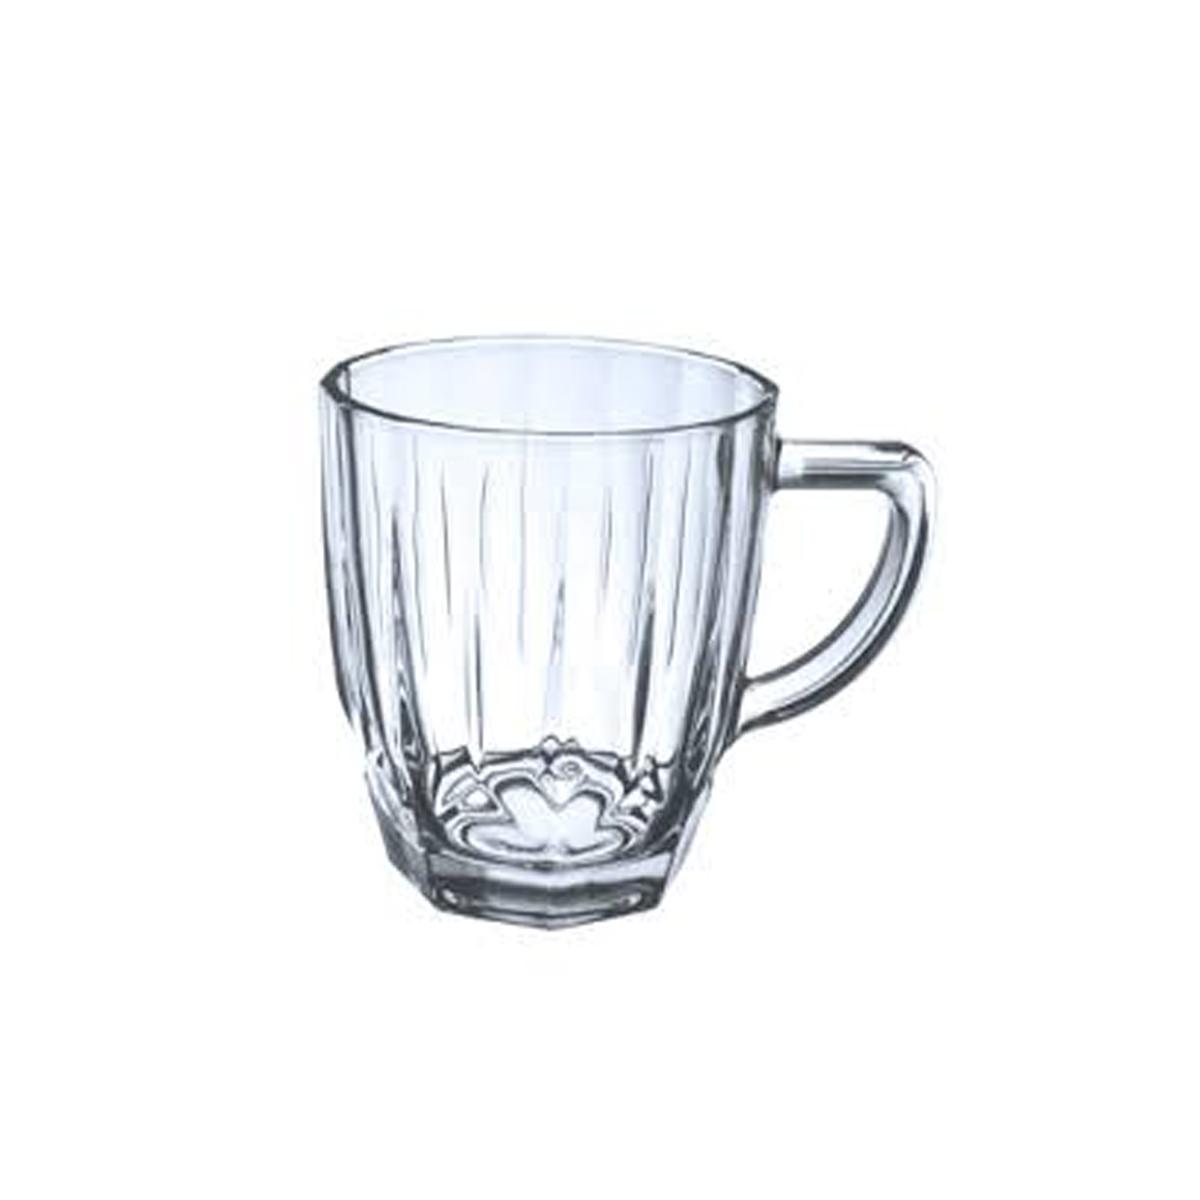 Indian Glass Vintage Tea Cup 190 ML